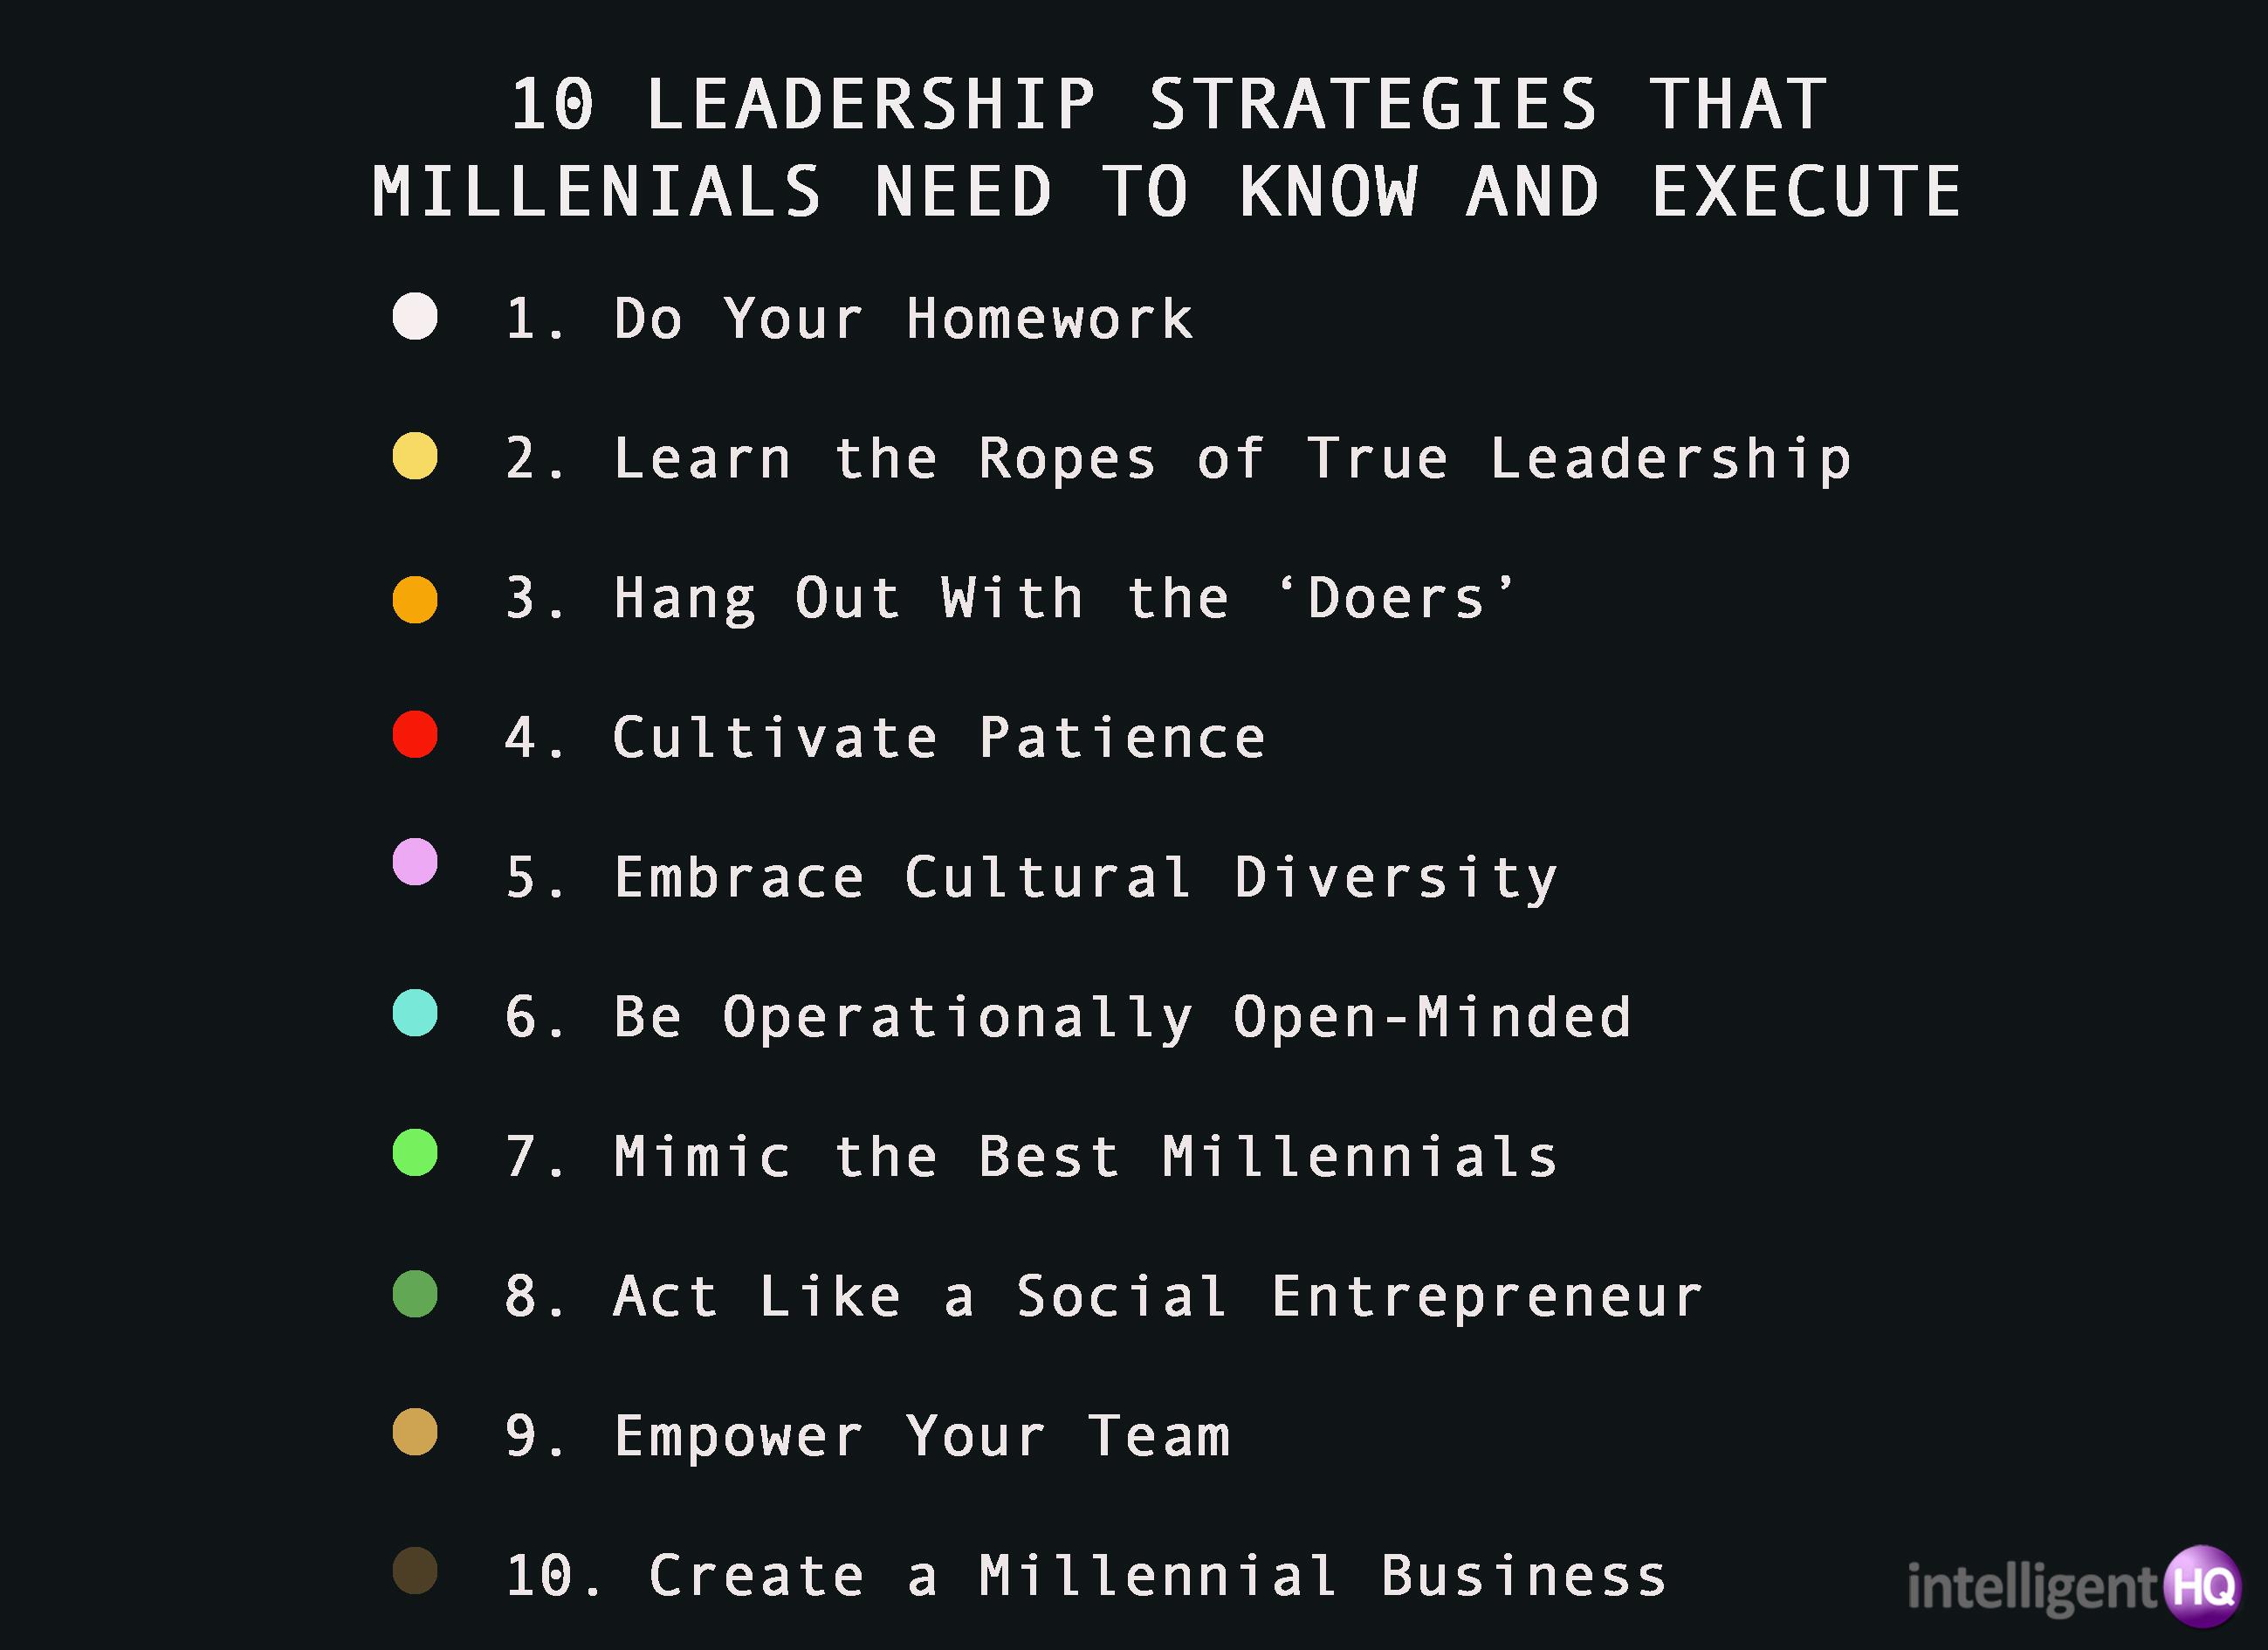 10 leadership strategies for millenials Intelligenthq